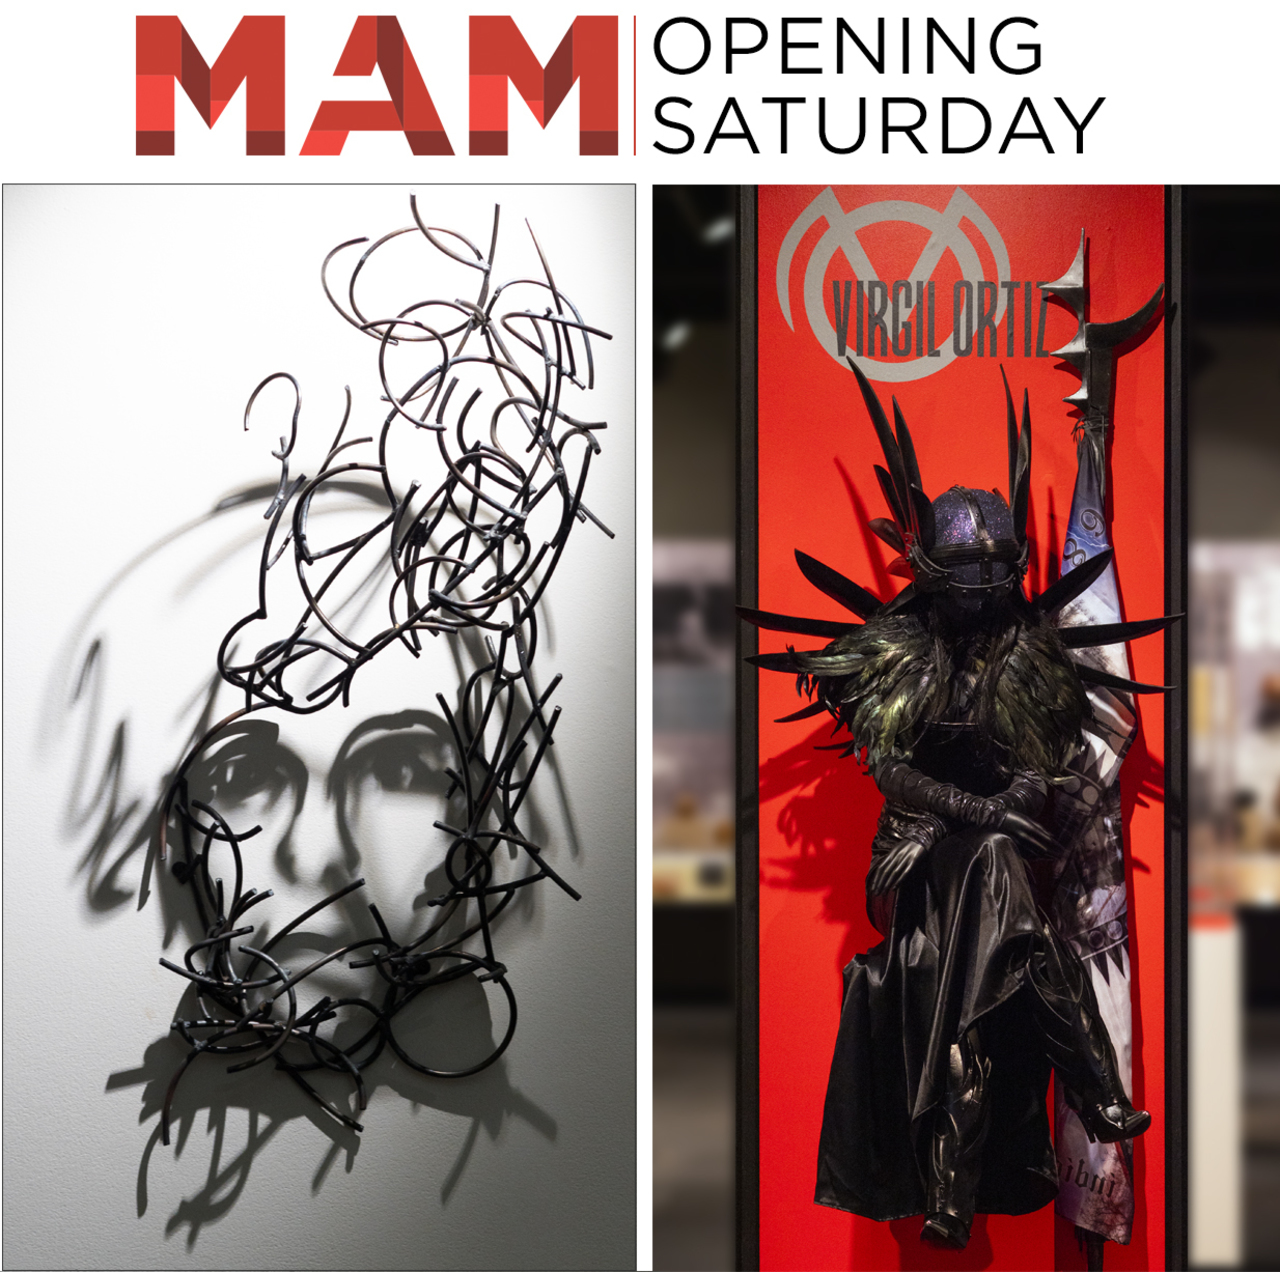 Opening this week at MAM